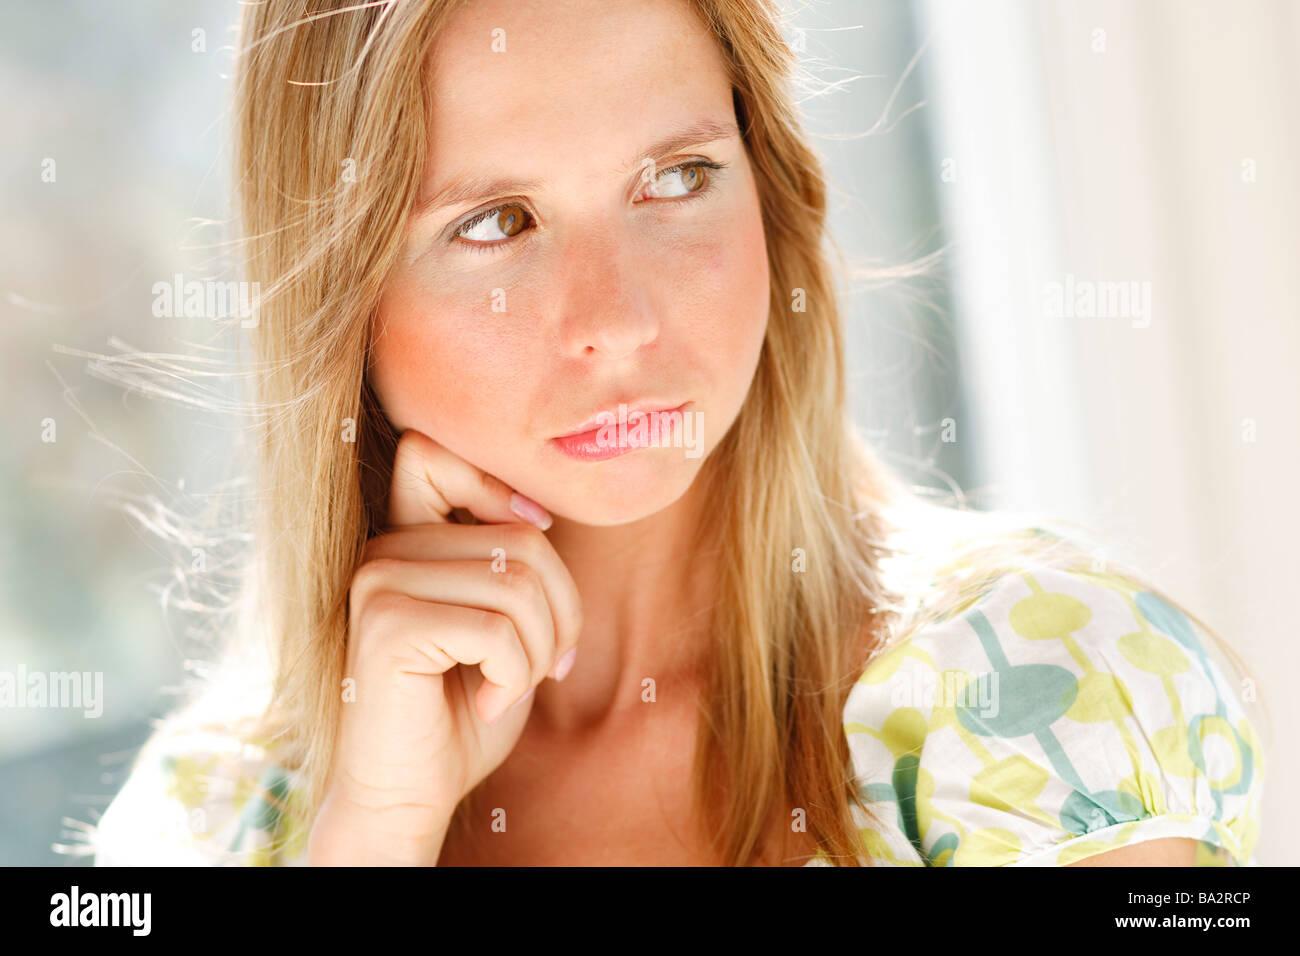 Grumpy woman - Stock Image